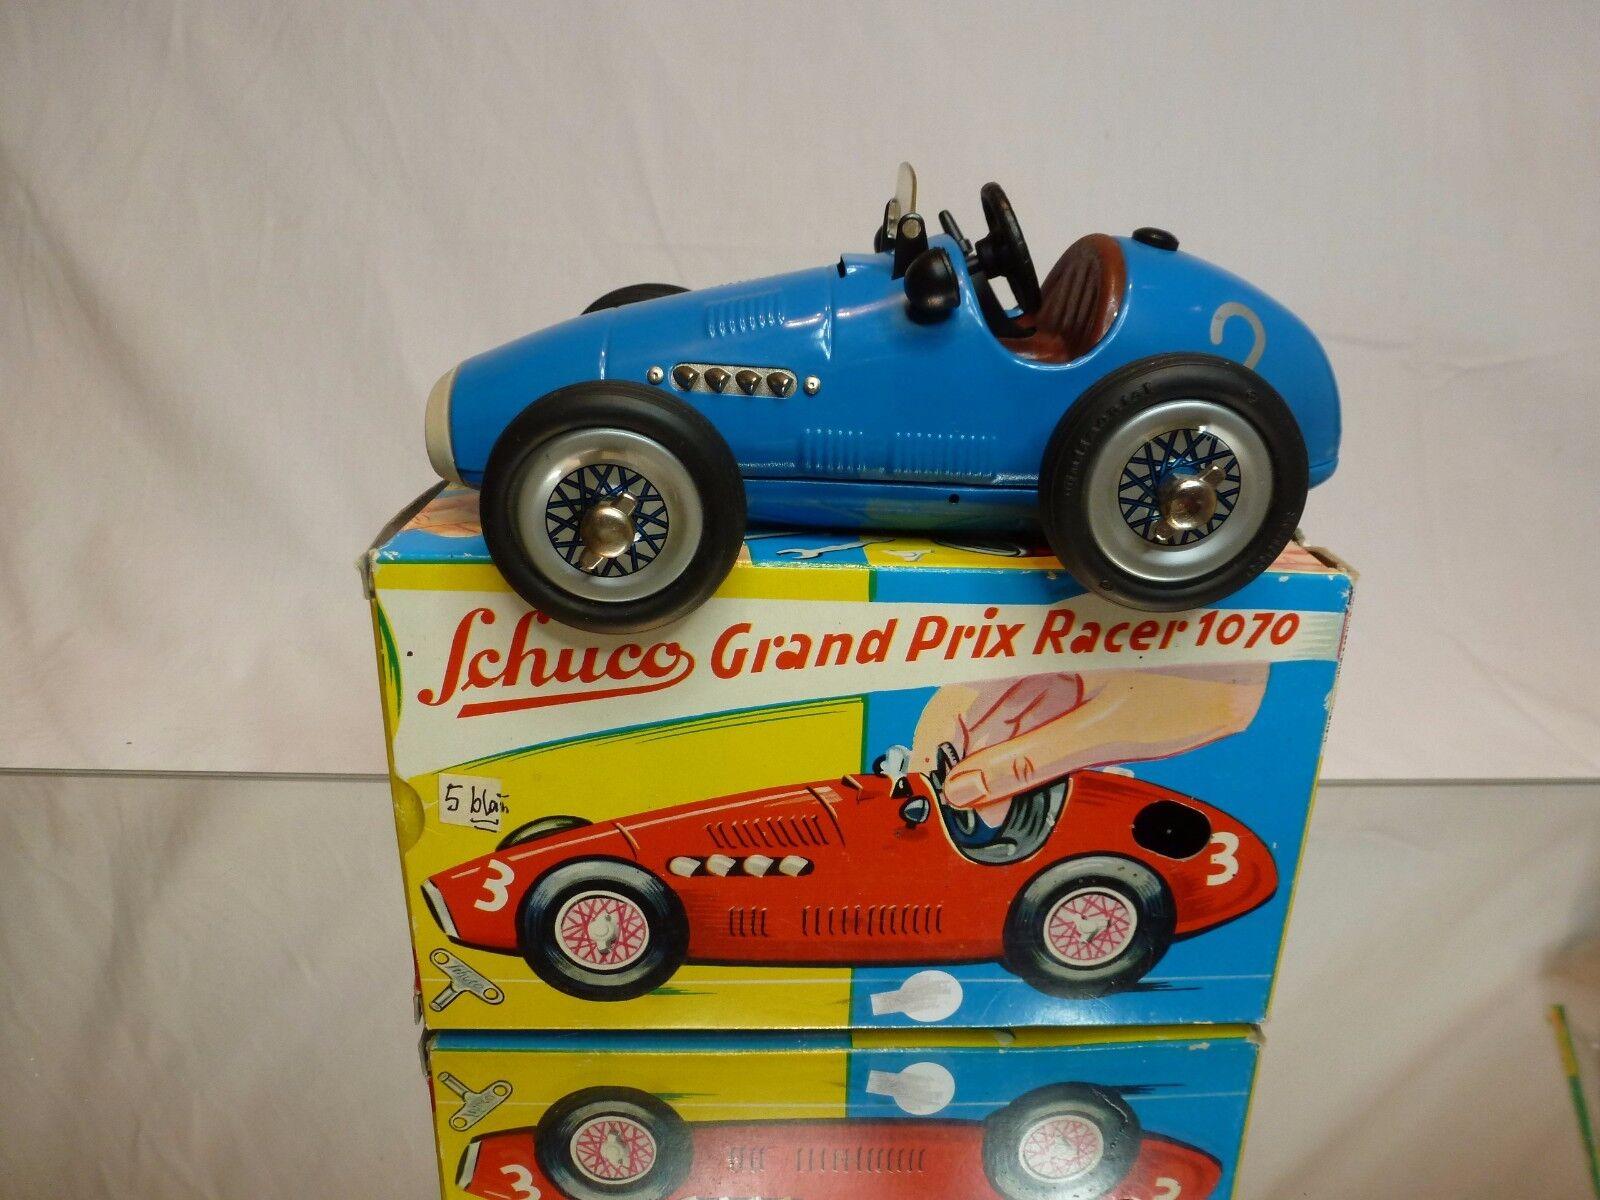 SCHUCO 1070 GRAND PRIX RACER  2 - F1 bleu L16.0cm - EXCELLENT CONDITION IN BOX